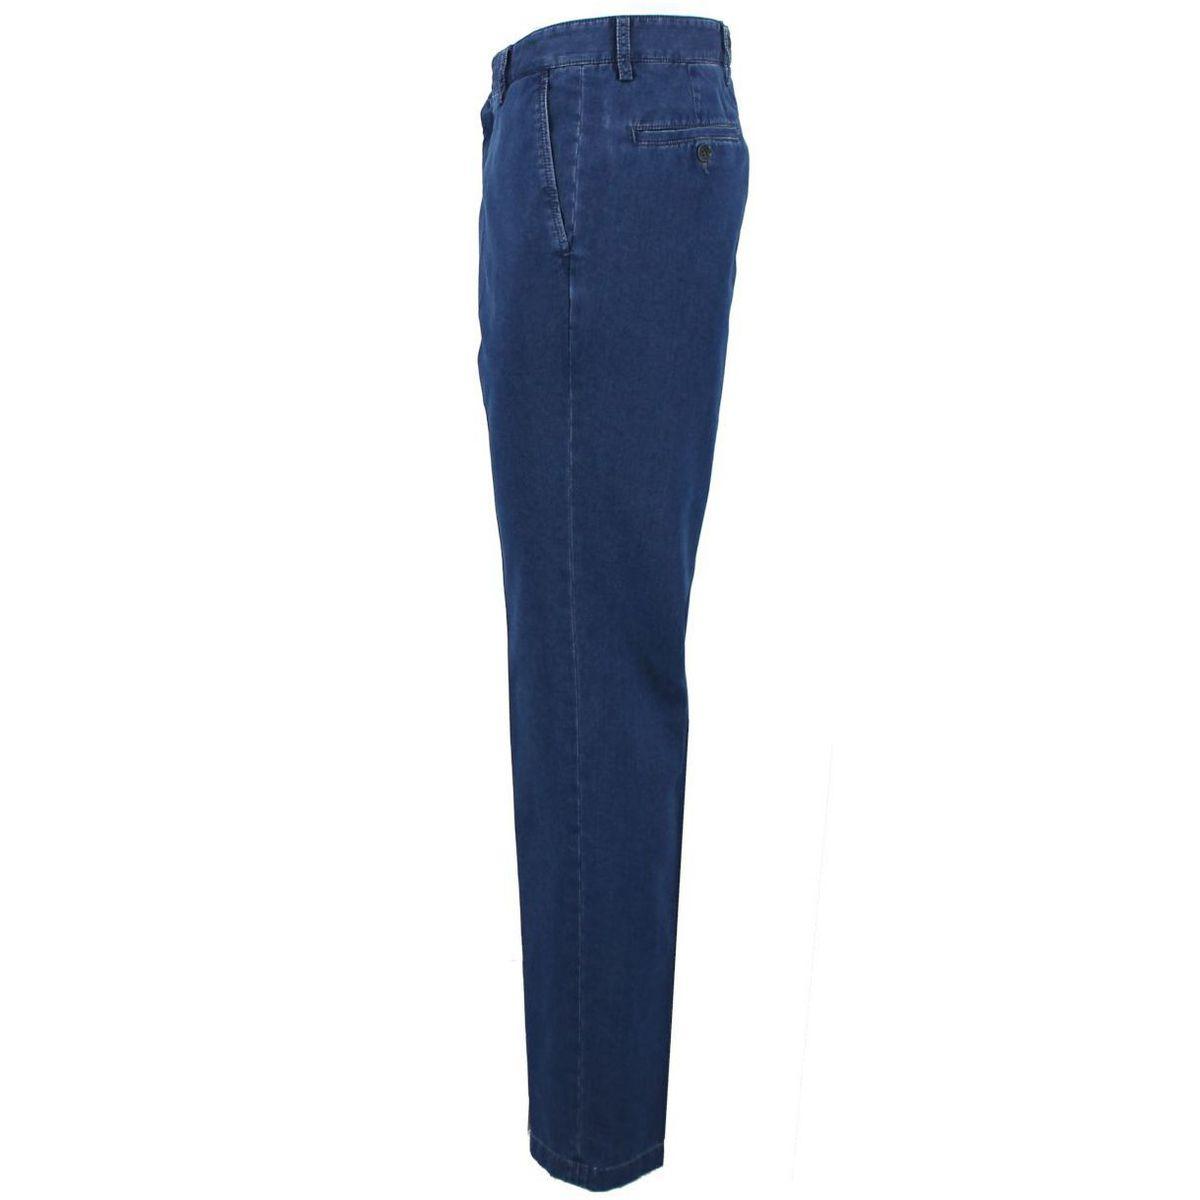 Jeans leggero vestibilità comfort Denim PAUL & SHARK